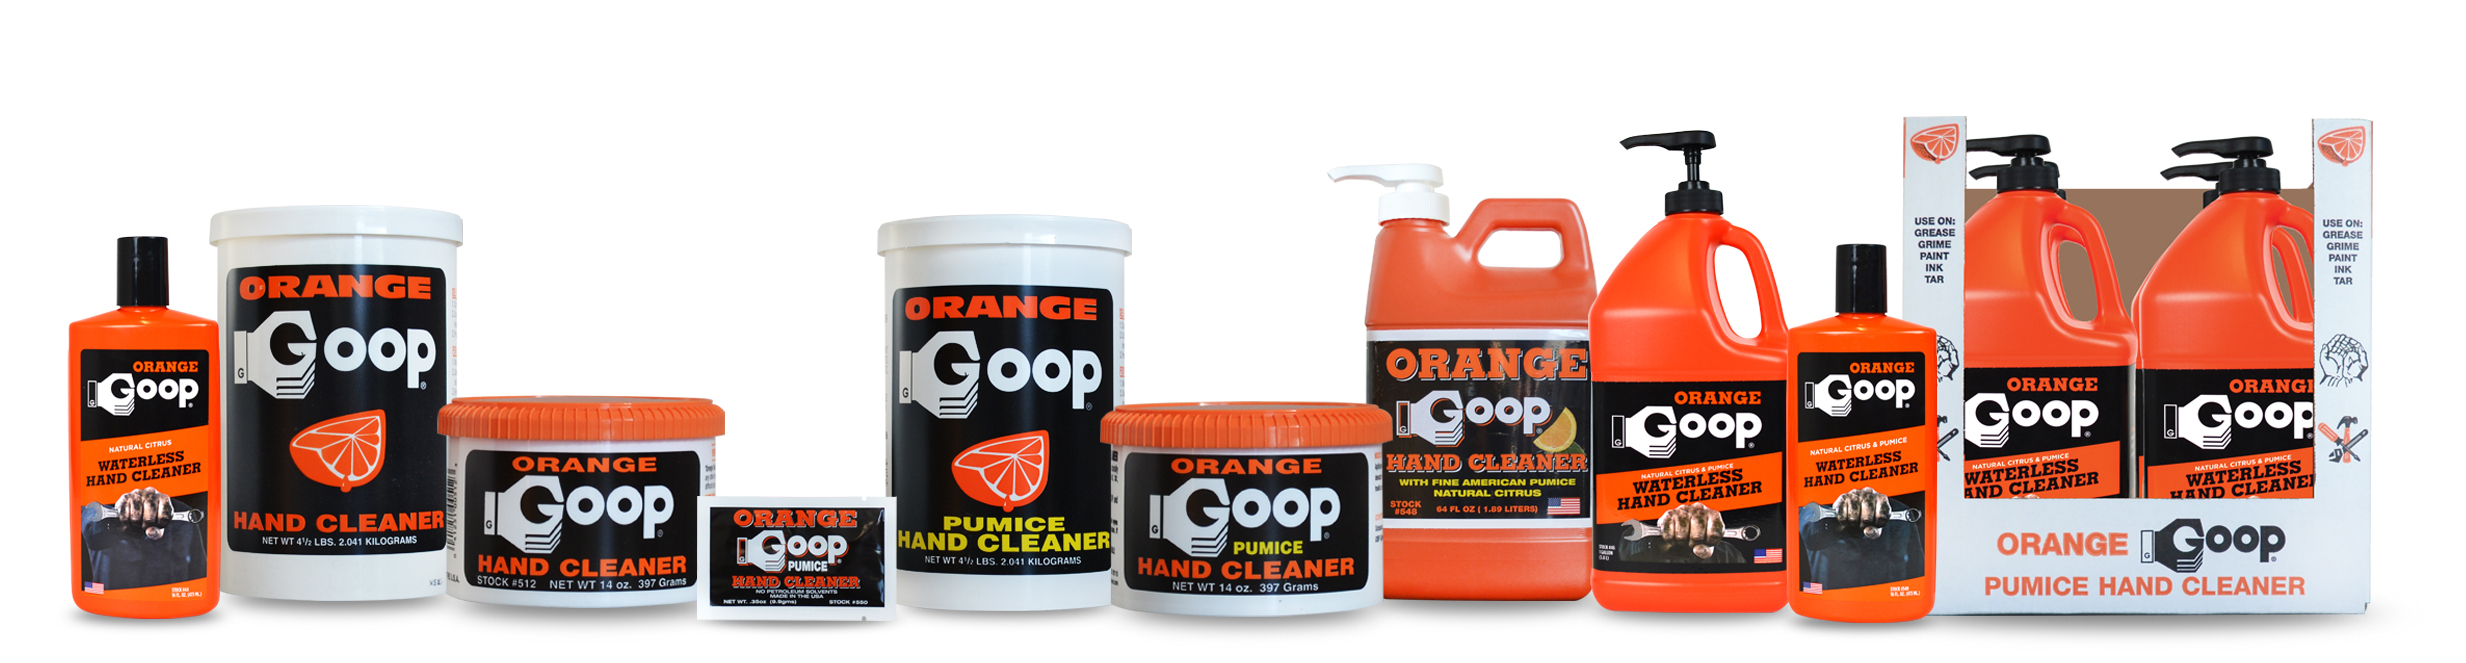 Moms-Goop-Orange-LINEUP-2466x663.jpg